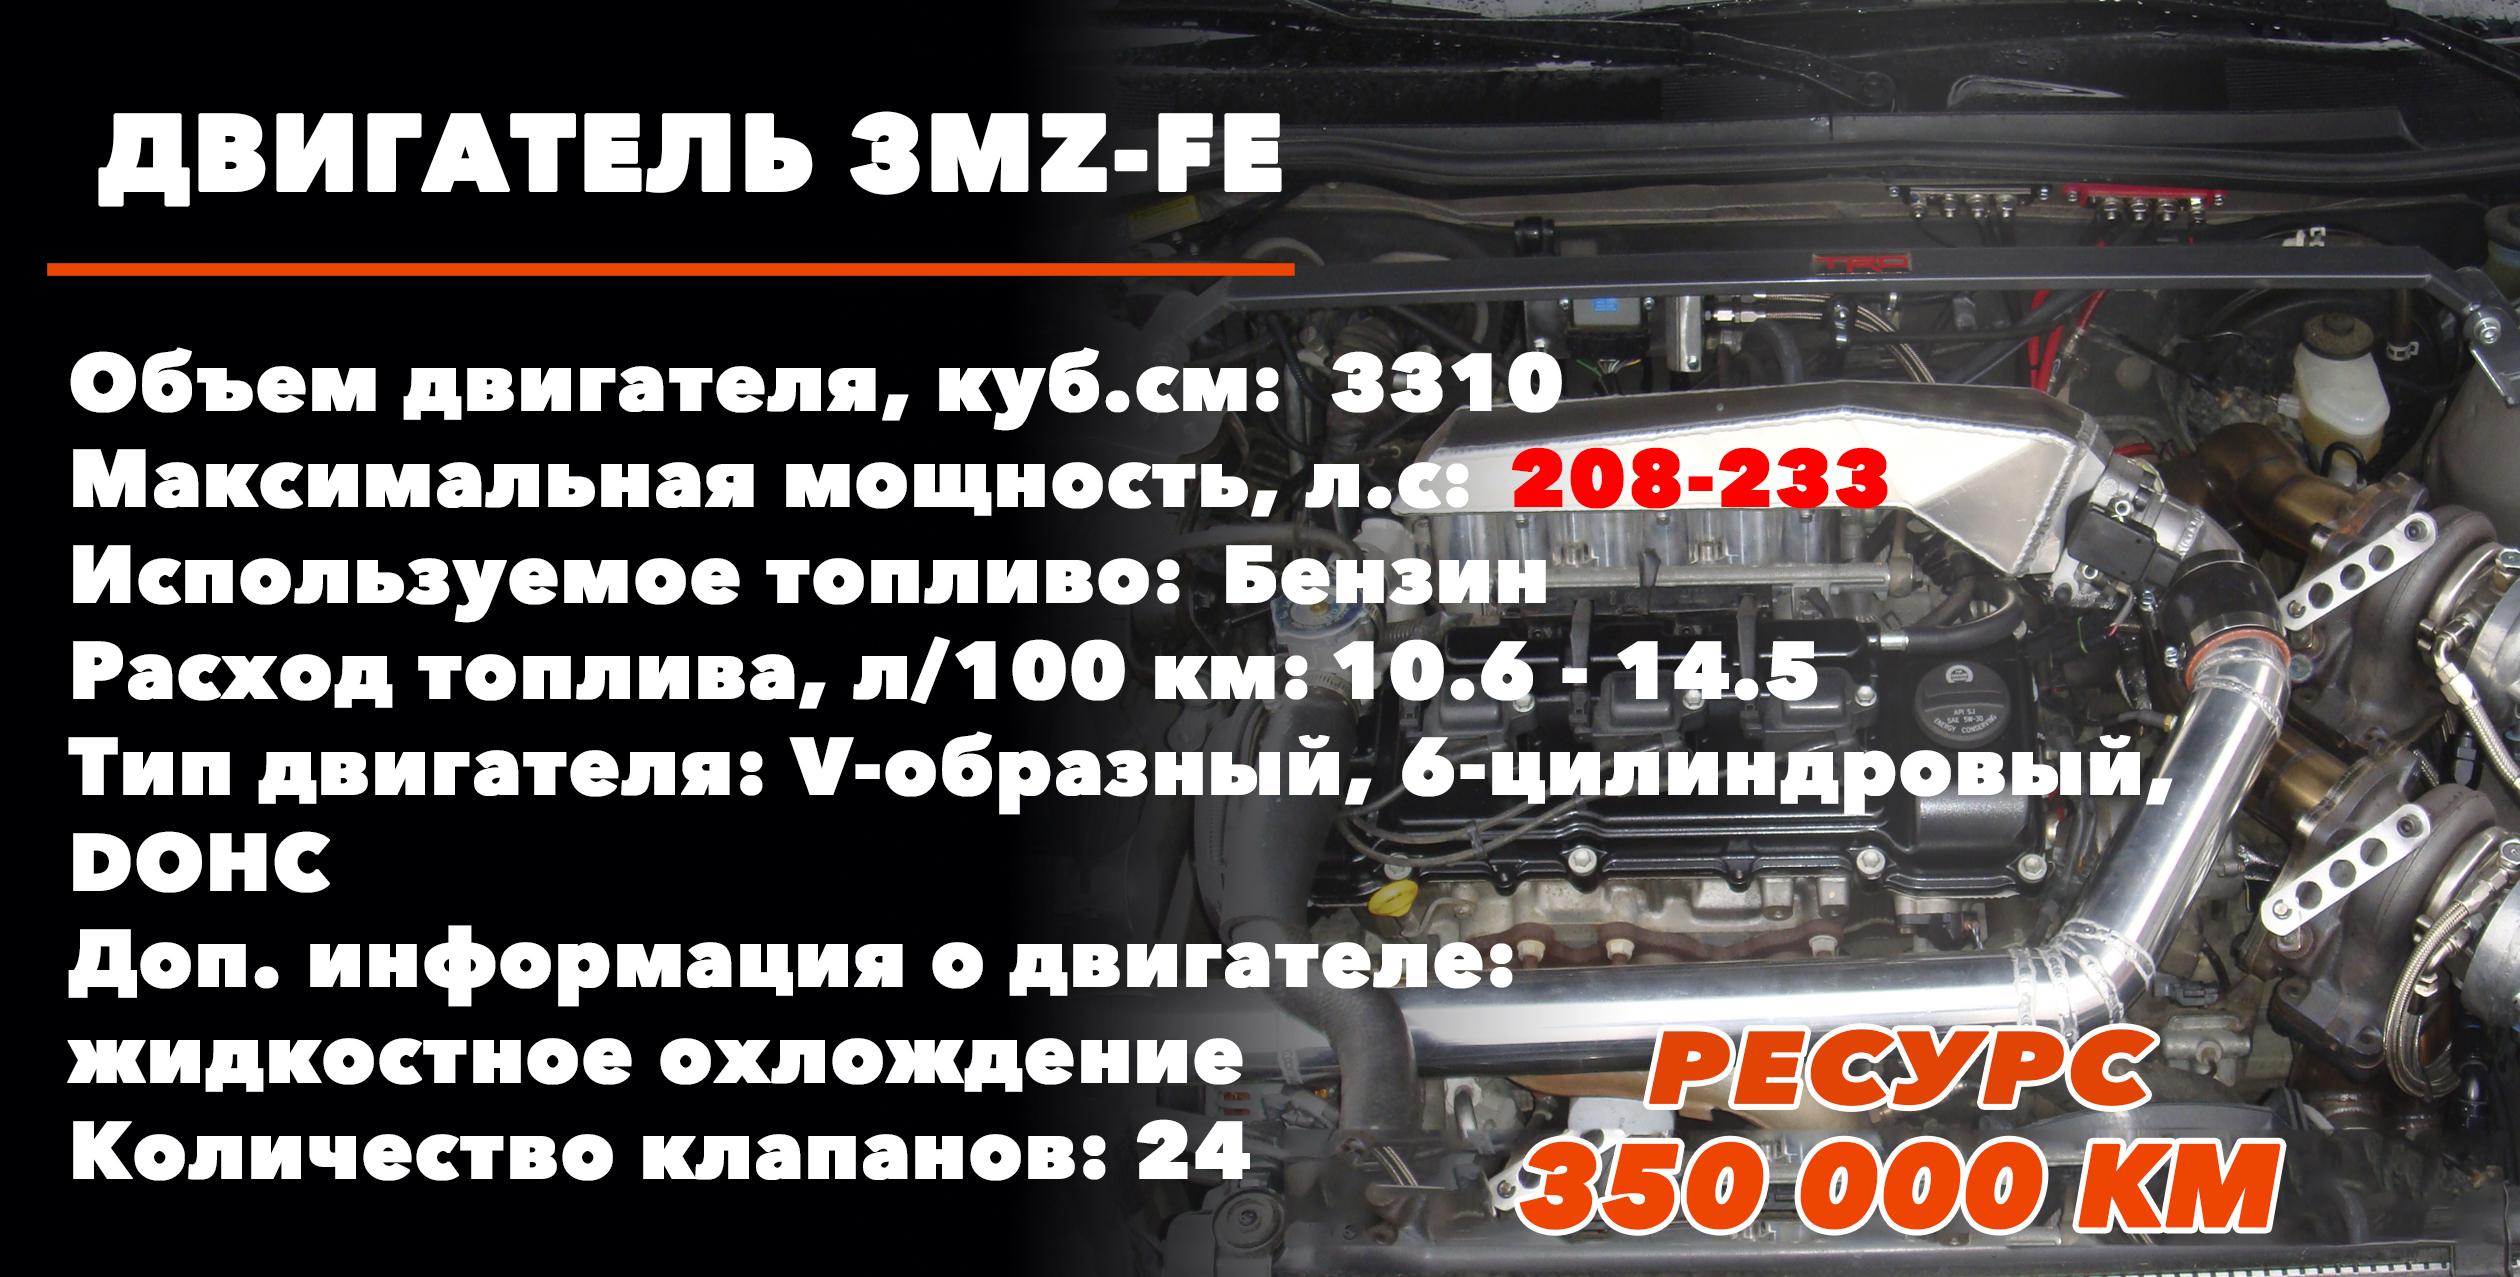 Ресурс двигателя 3MZ-FE 3.3